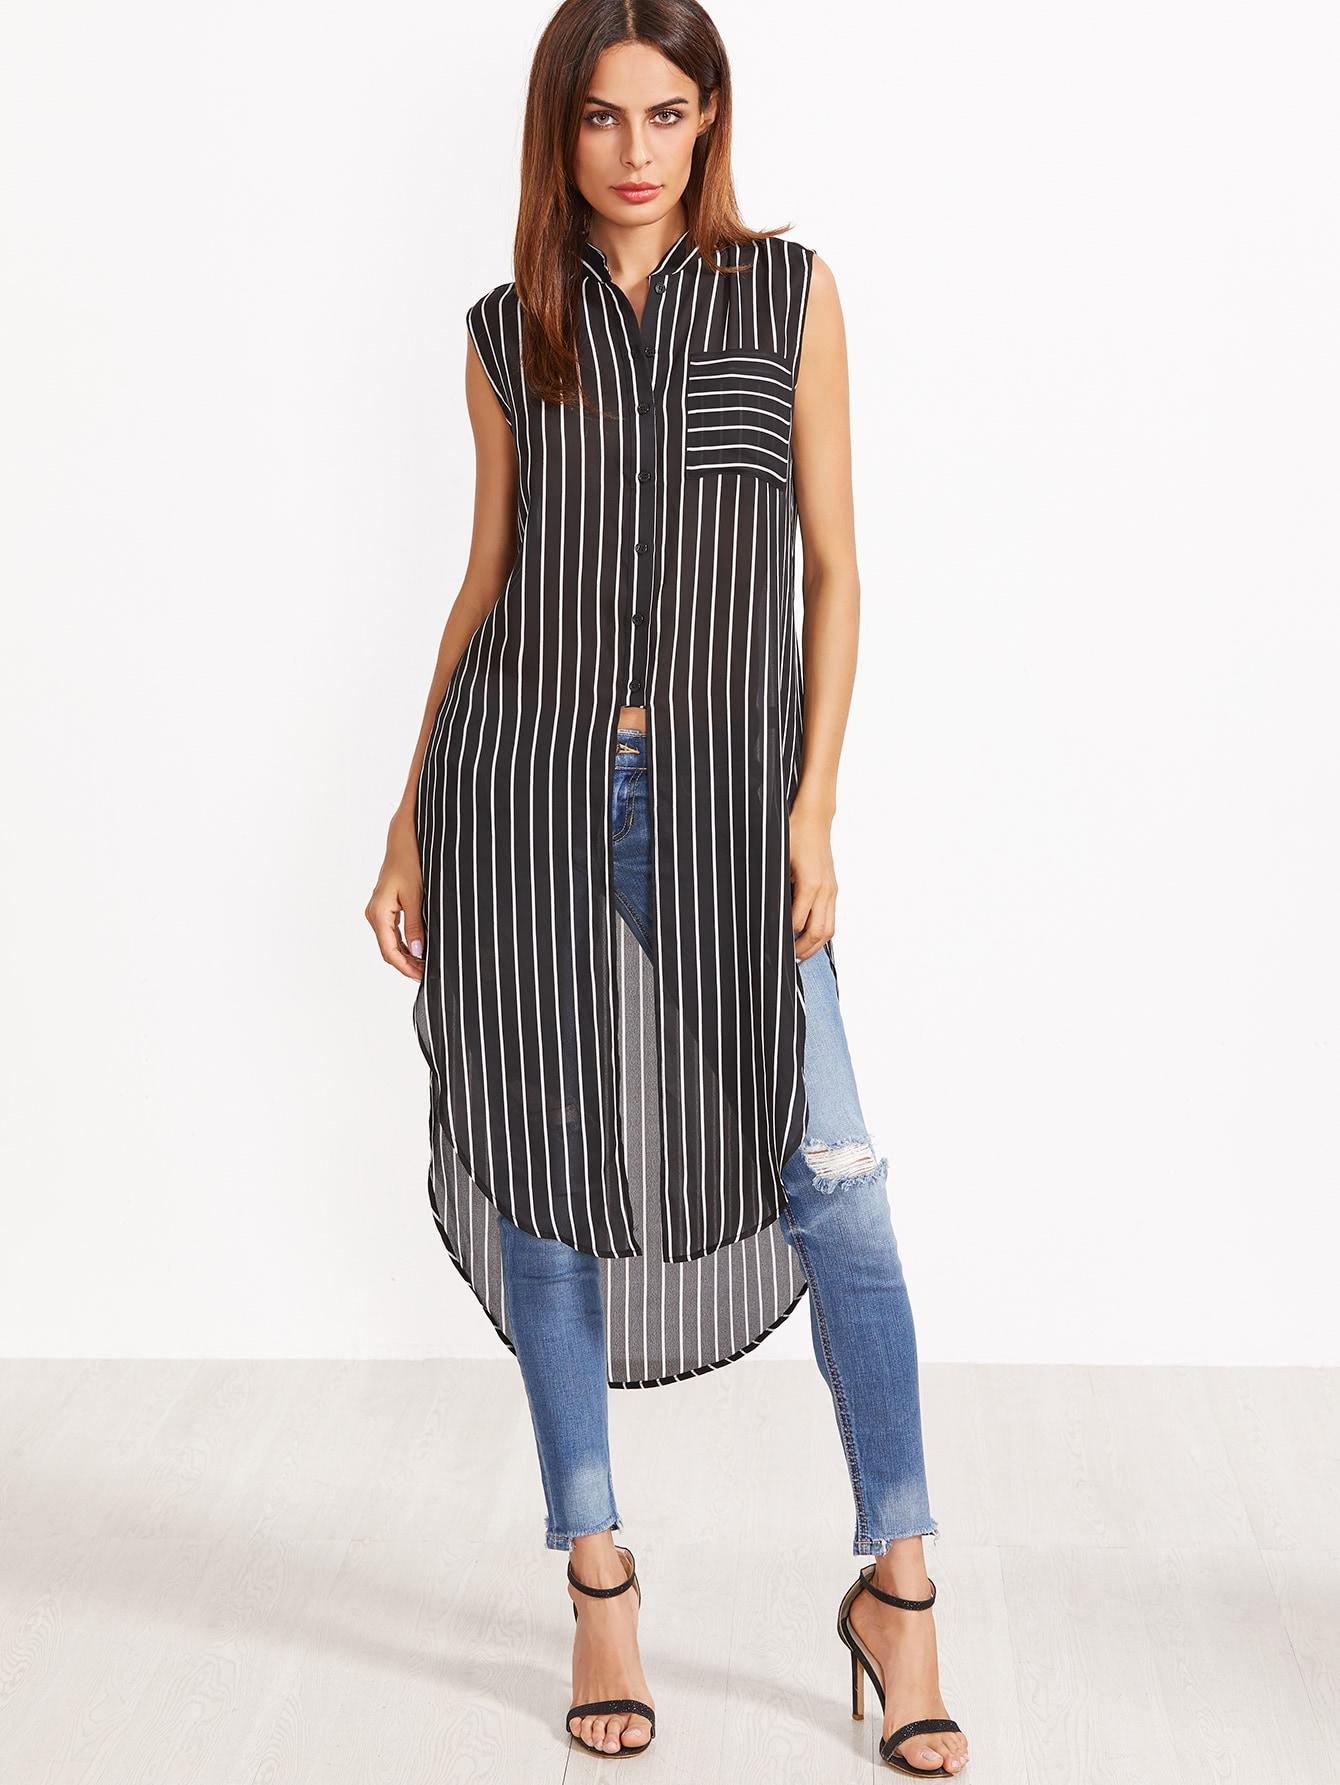 blouse161130720_2